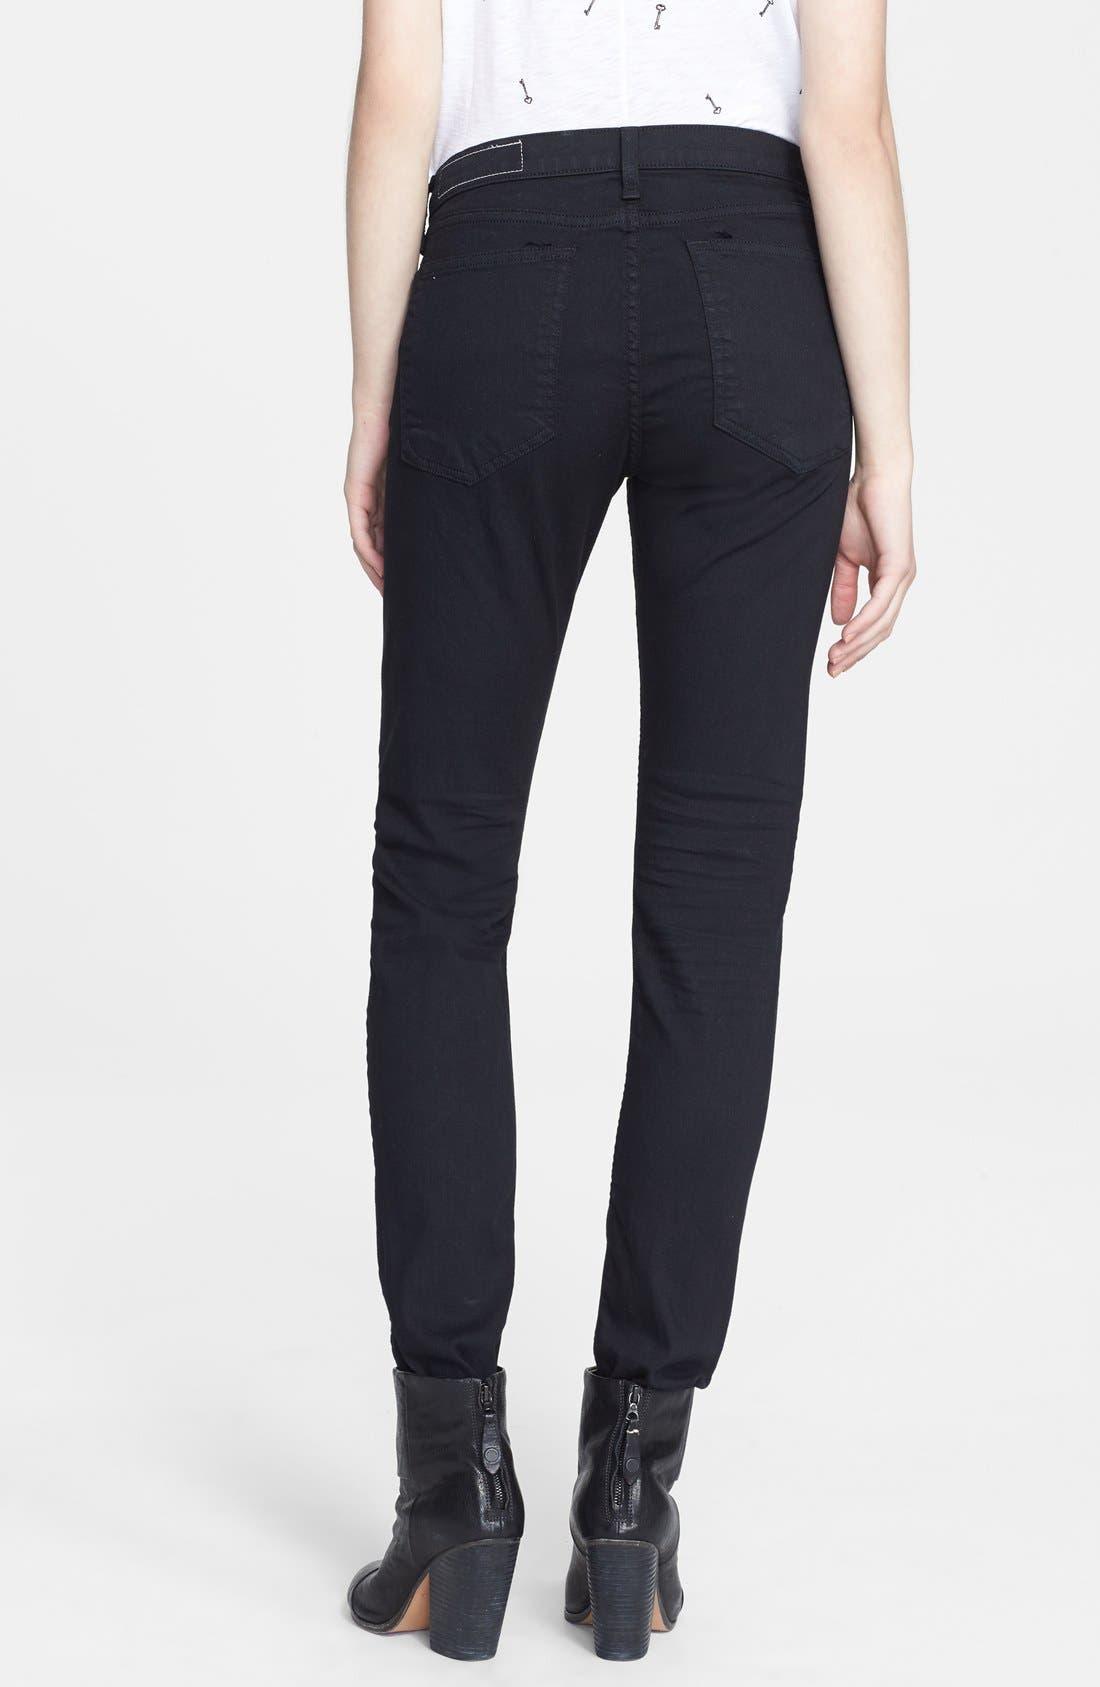 'The Dre' Skinny Jeans,                             Alternate thumbnail 2, color,                             Aged Black